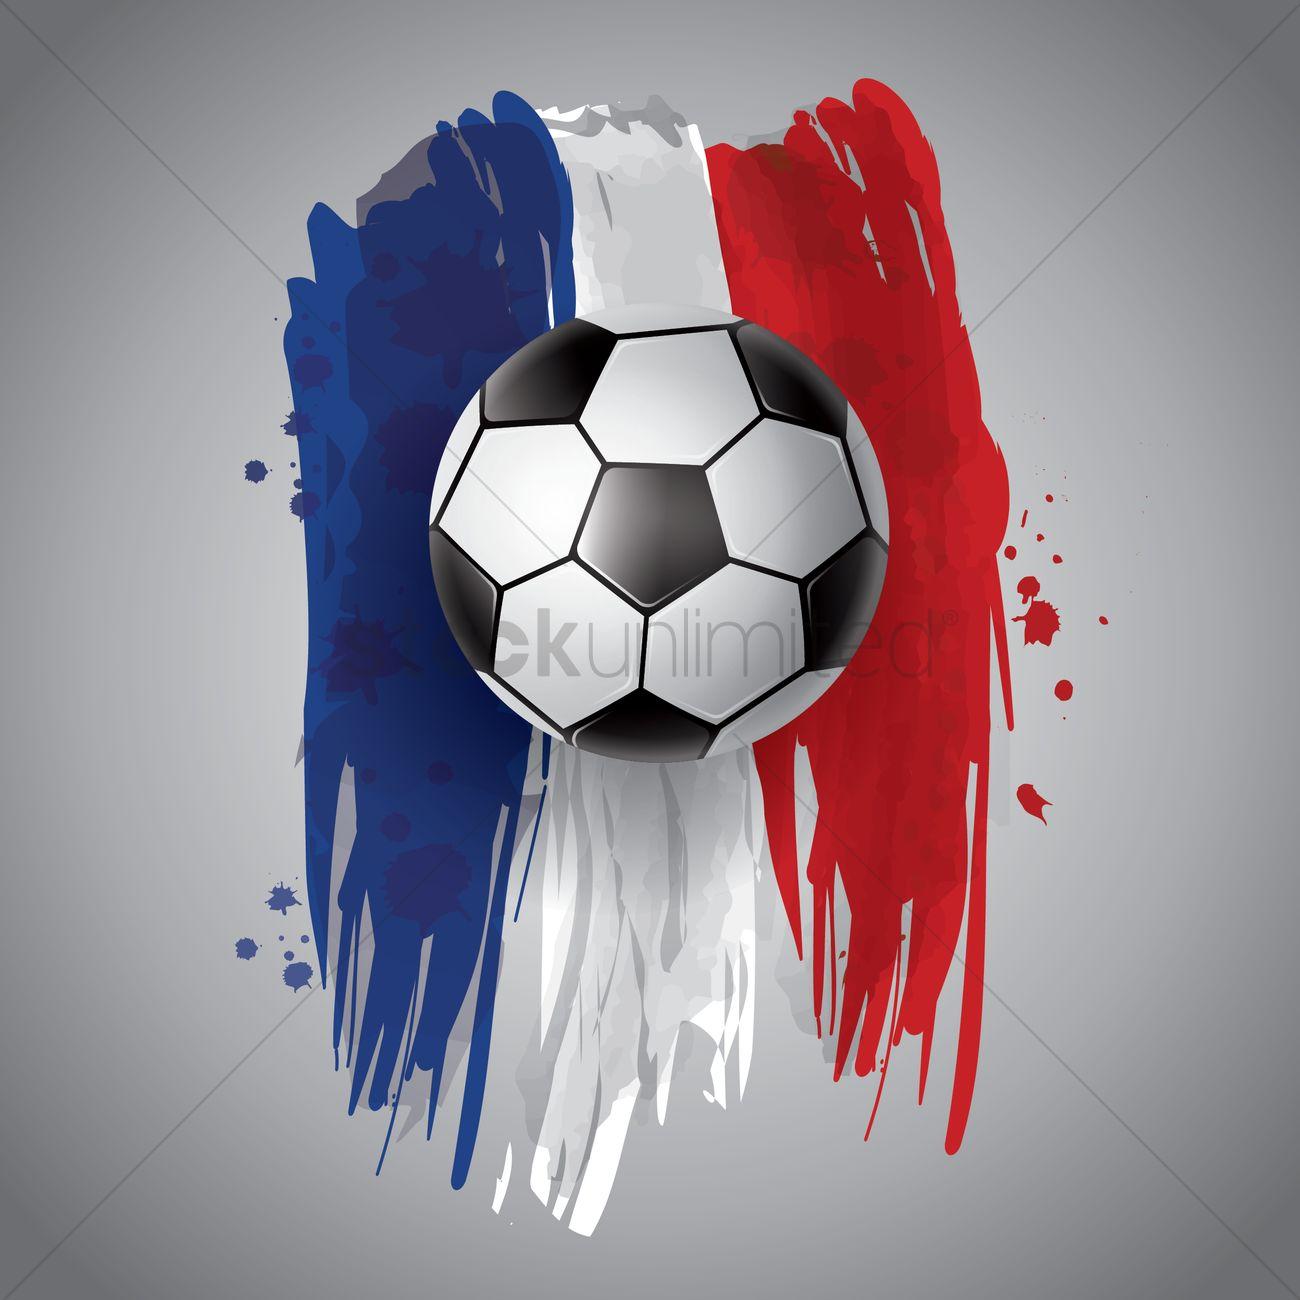 france soccer wallpaper vector image 1816817 stockunlimited